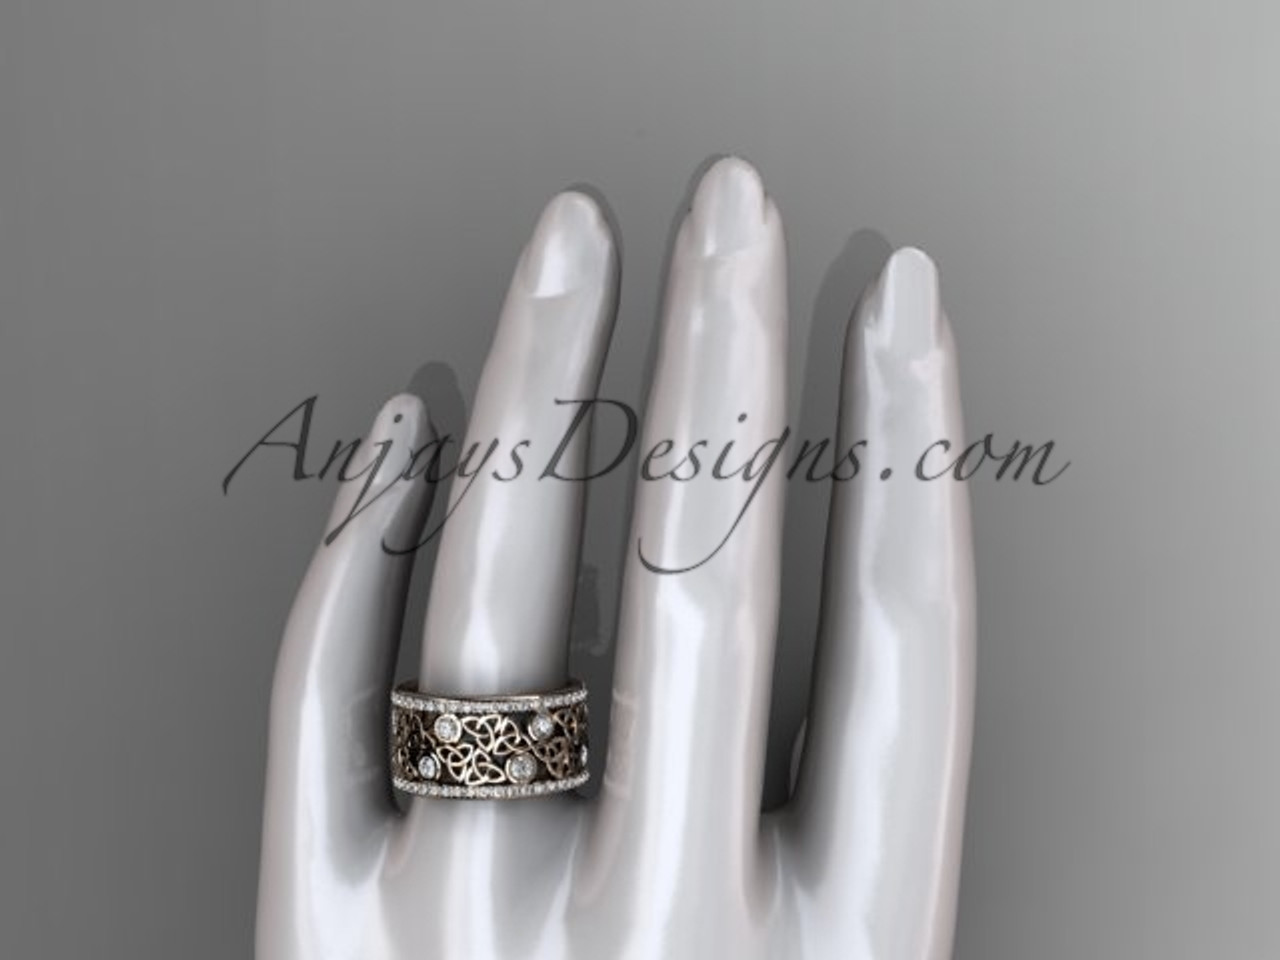 77 Carats 100/% Forged EngravedSilver Plated Handmade PendantArtisan Jewelry Natural TourmalineZirconArt